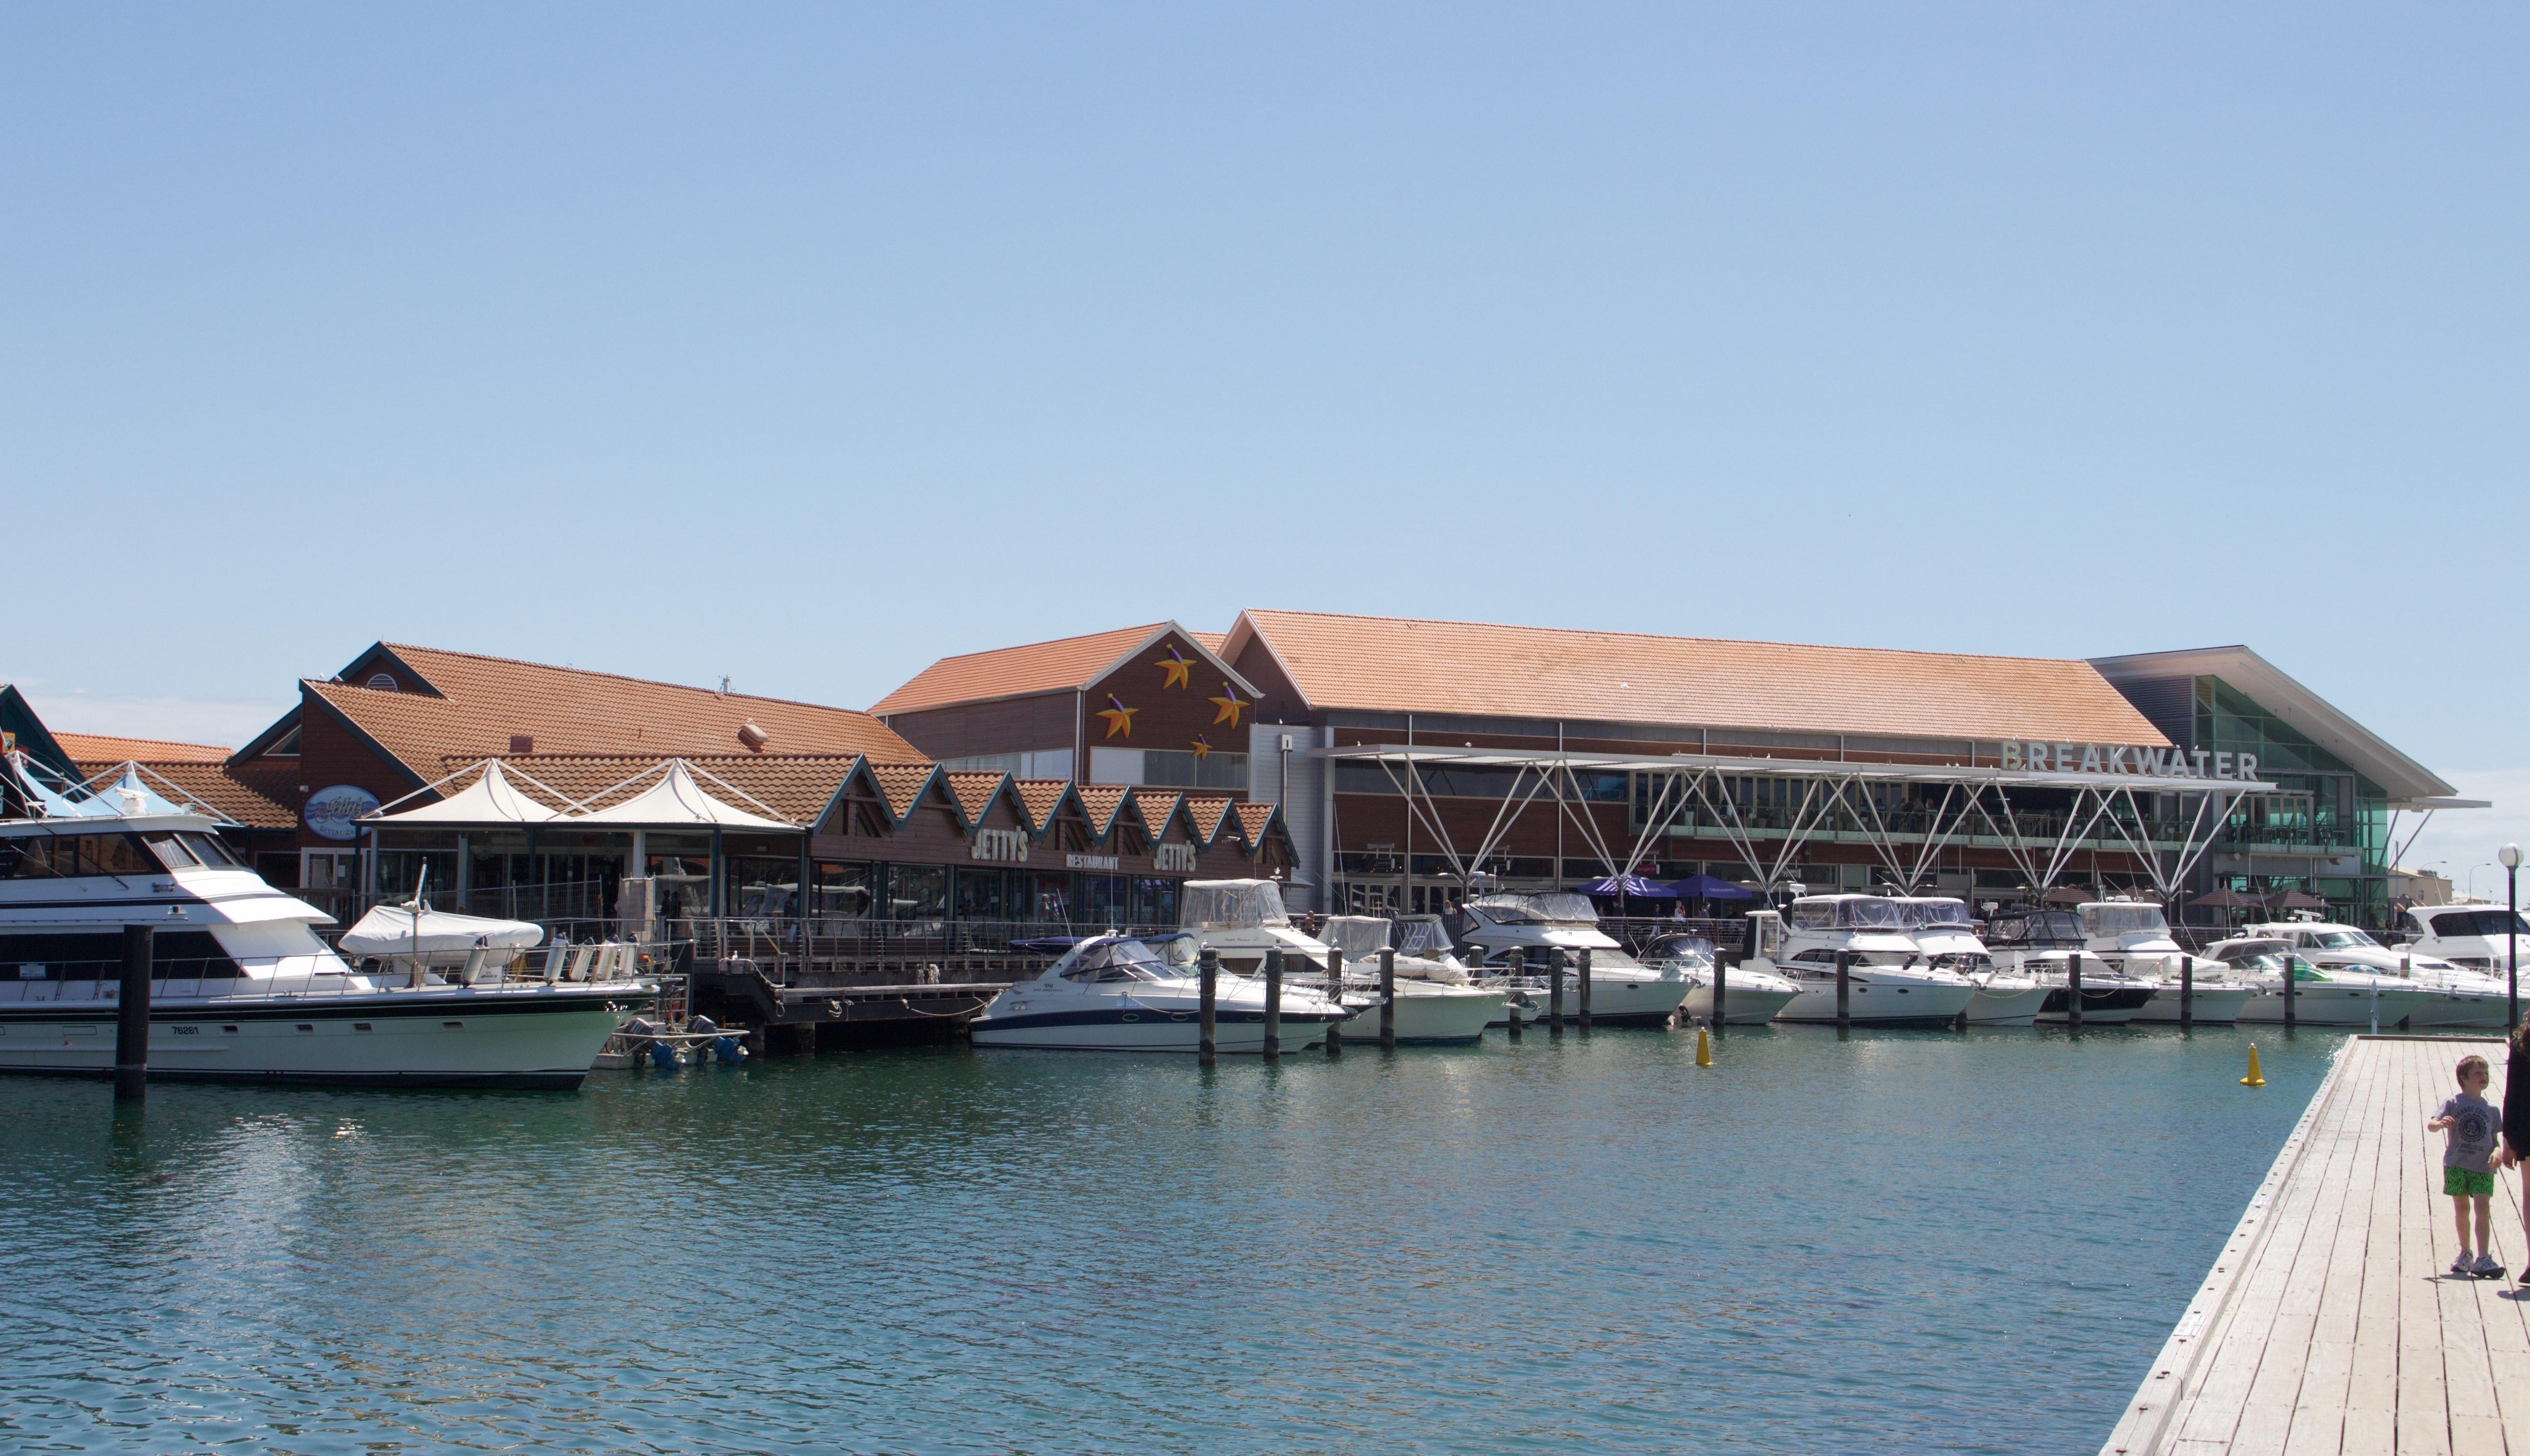 Boat Harbour Australia  city images : Hillary's Boat Harbour, Perth Western Australia Wikipedia ...